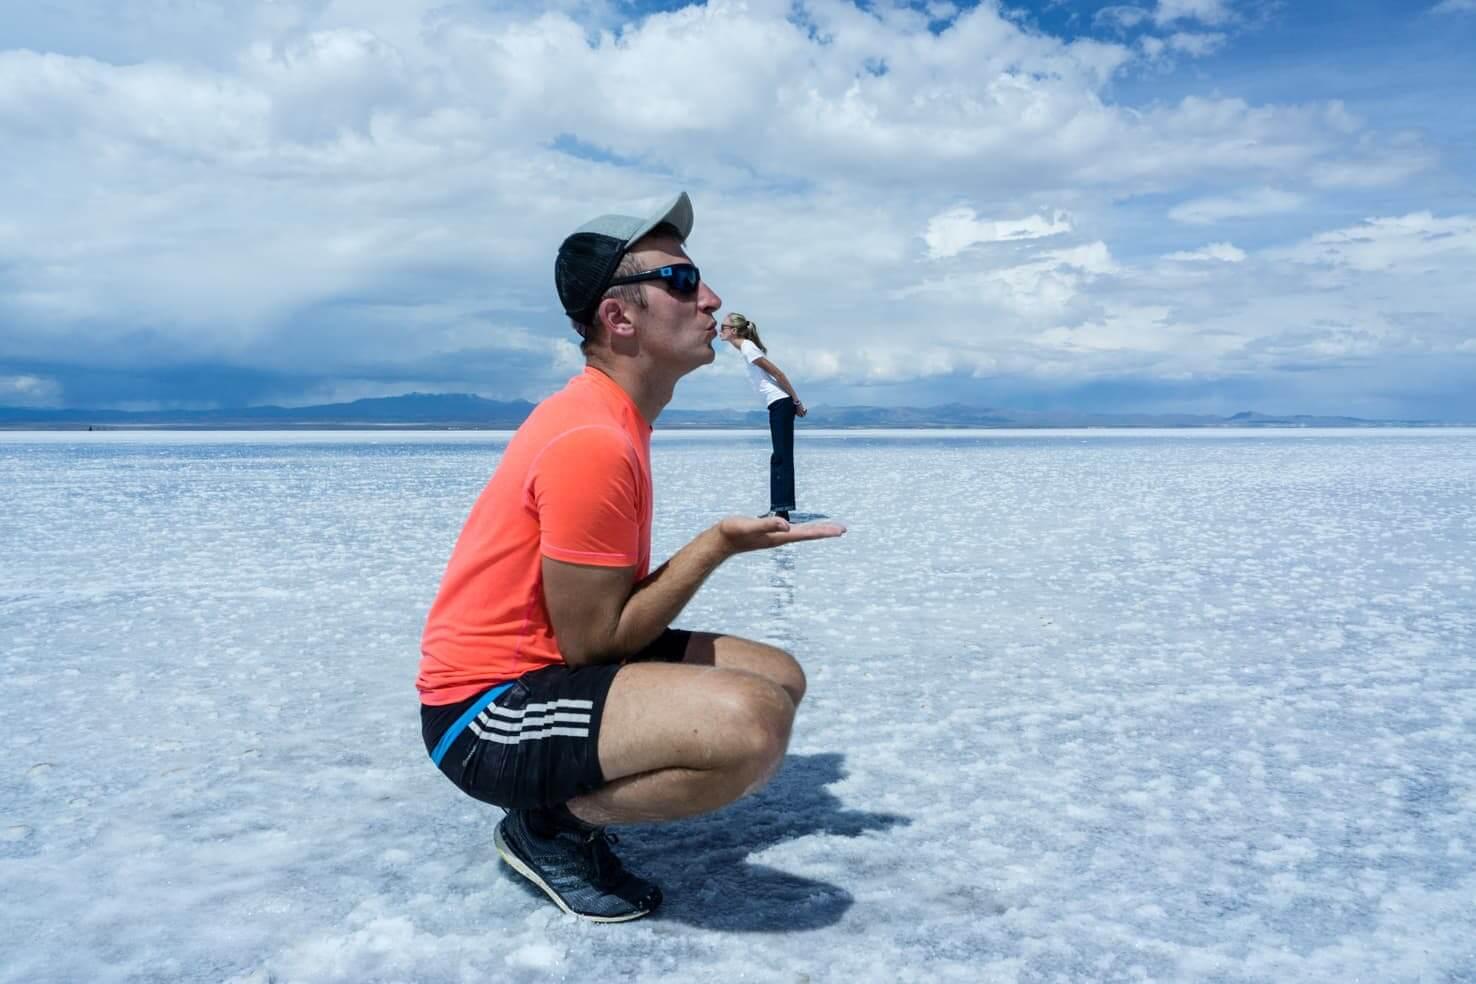 Snow In Desert Salt Flats In Bolivia A Complete Guide To Salar De Uyuni Tour